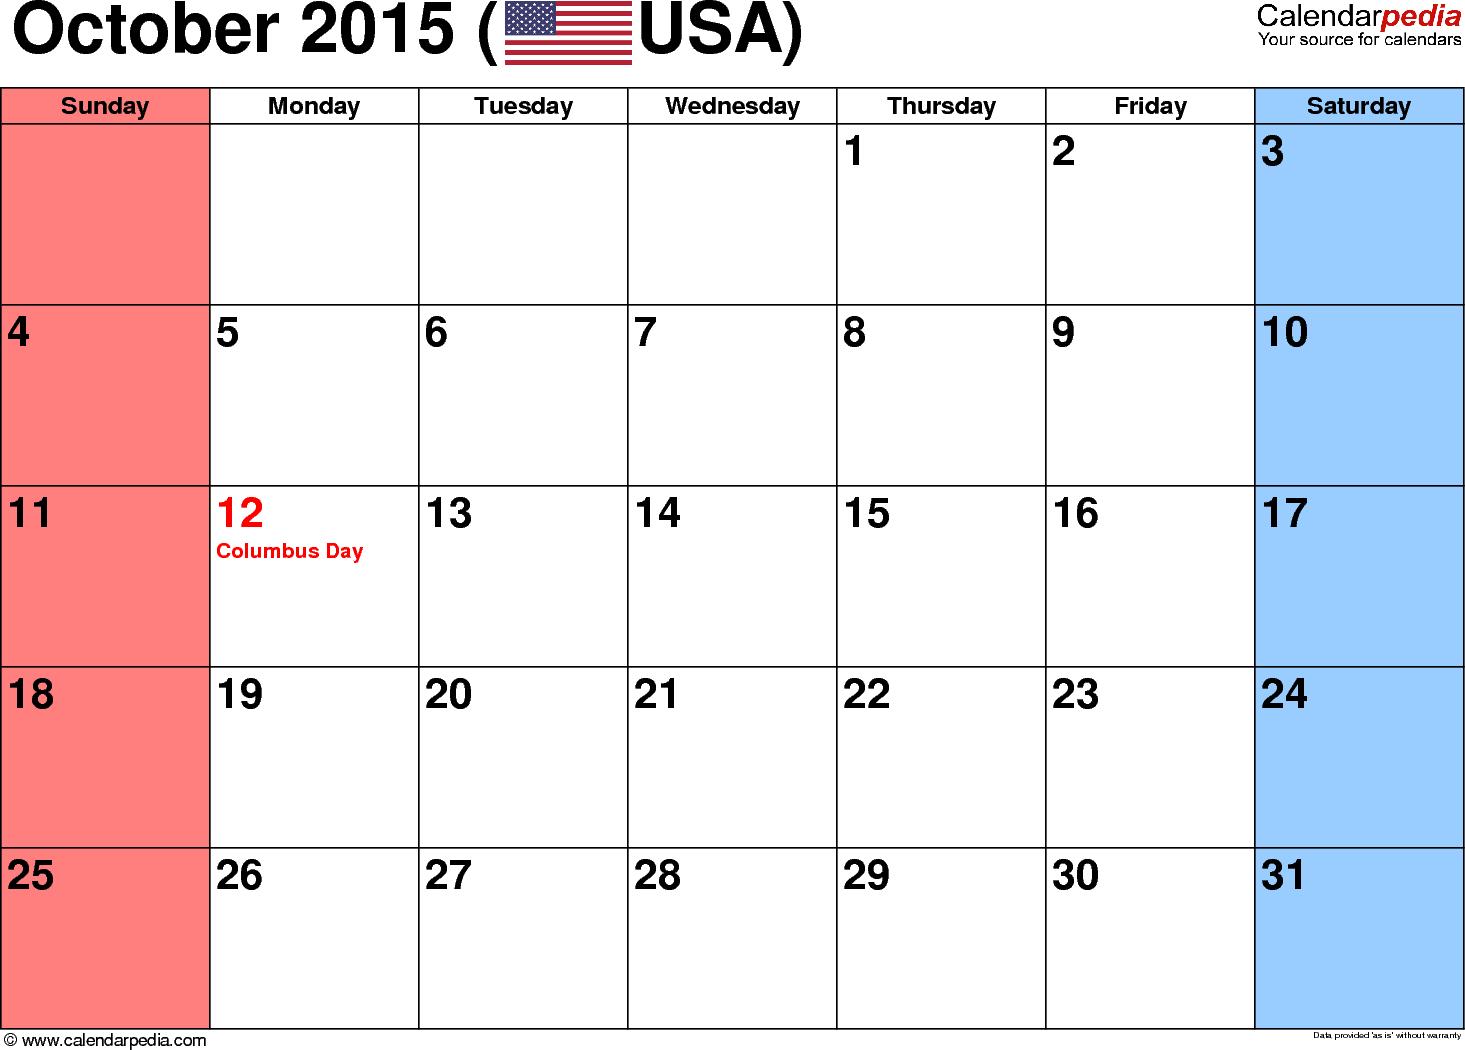 Blank October 2015 calendar